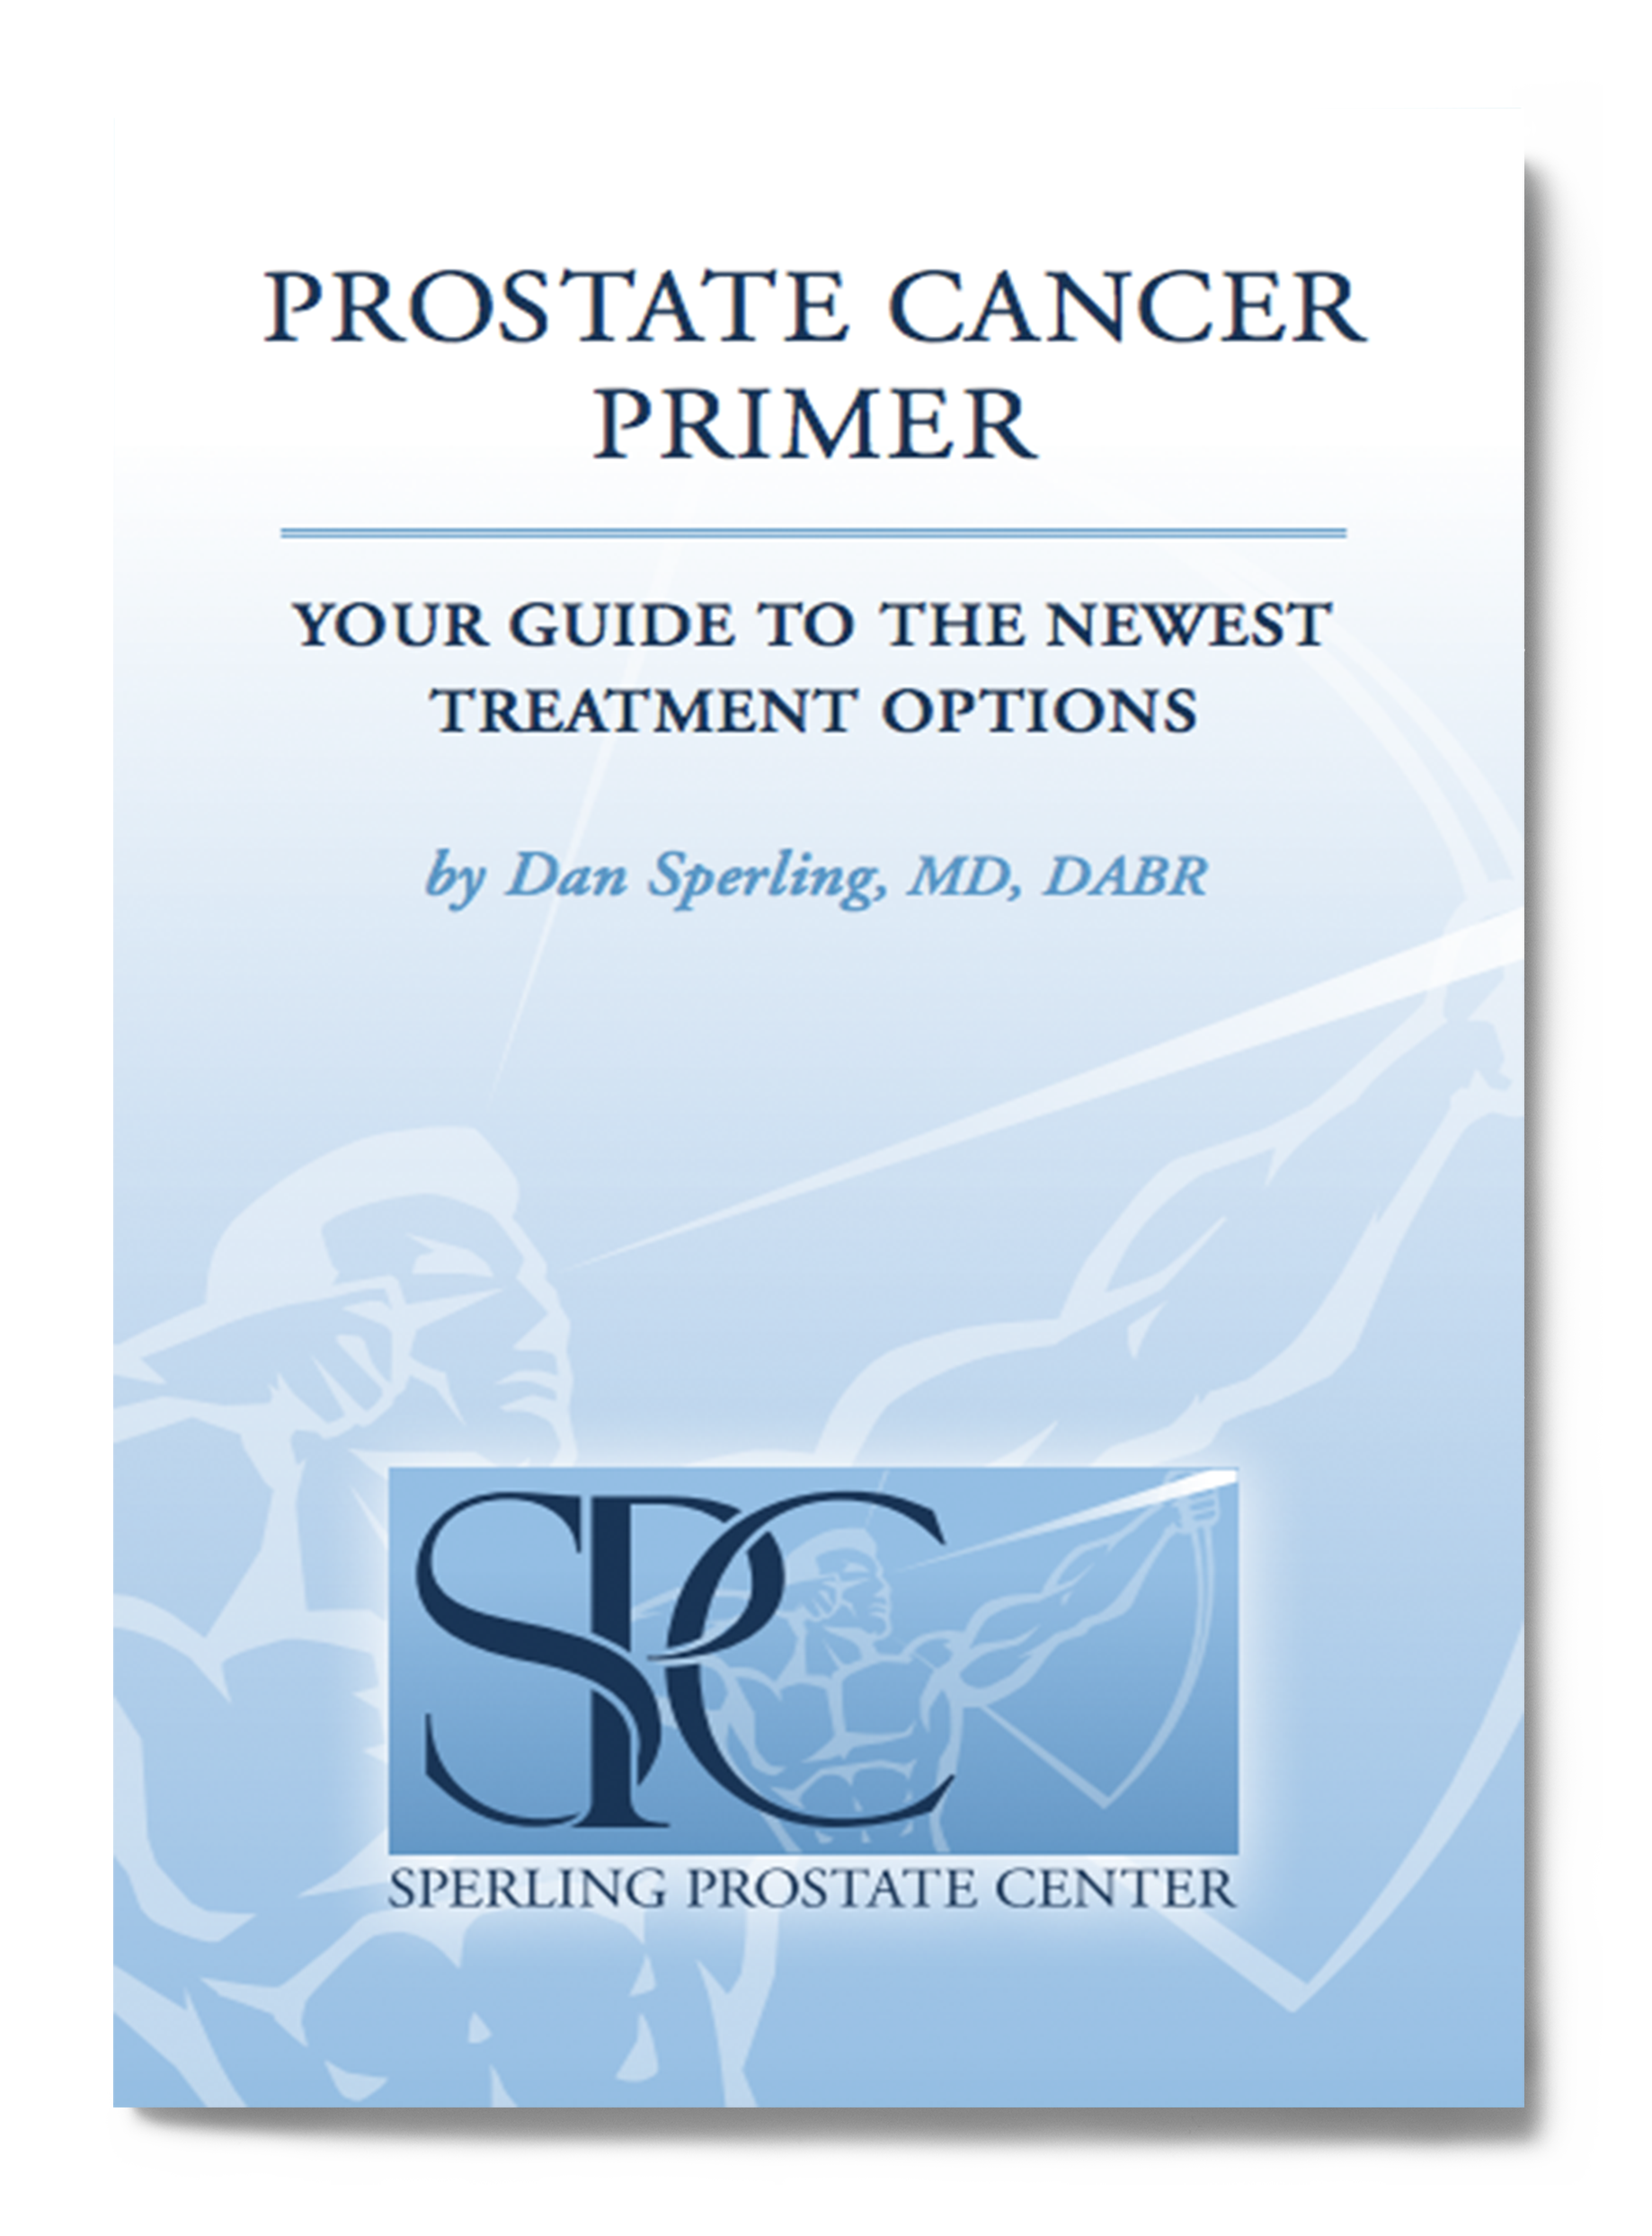 Prostate Cancer Primer